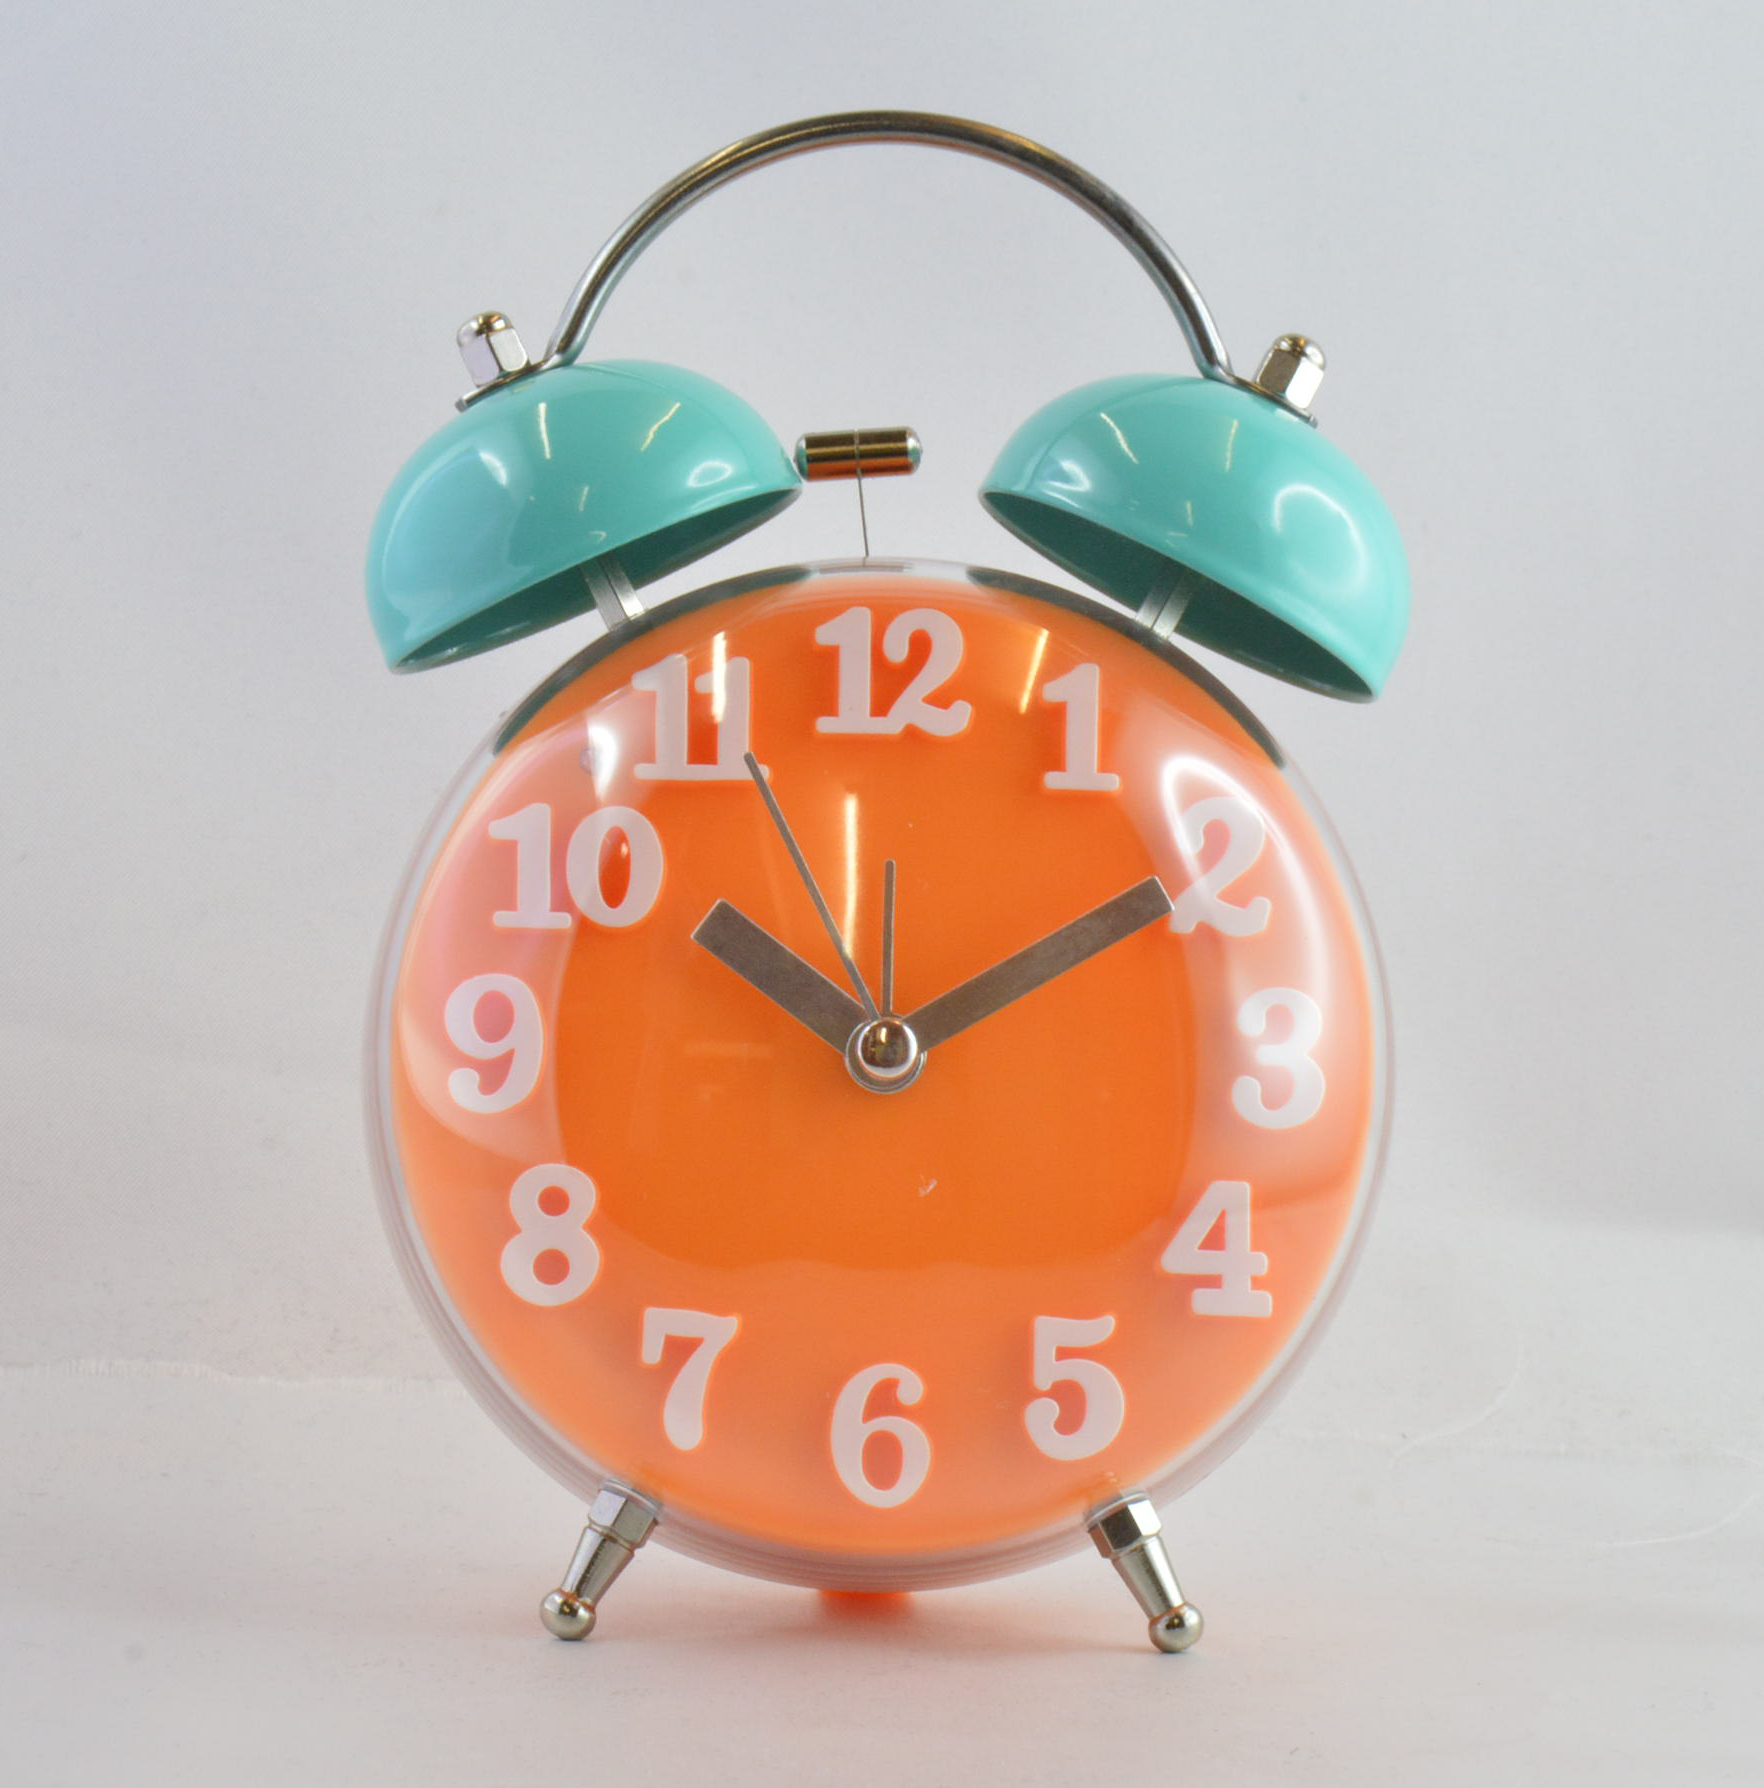 Sveglia Mascagni cod. A828 arancione